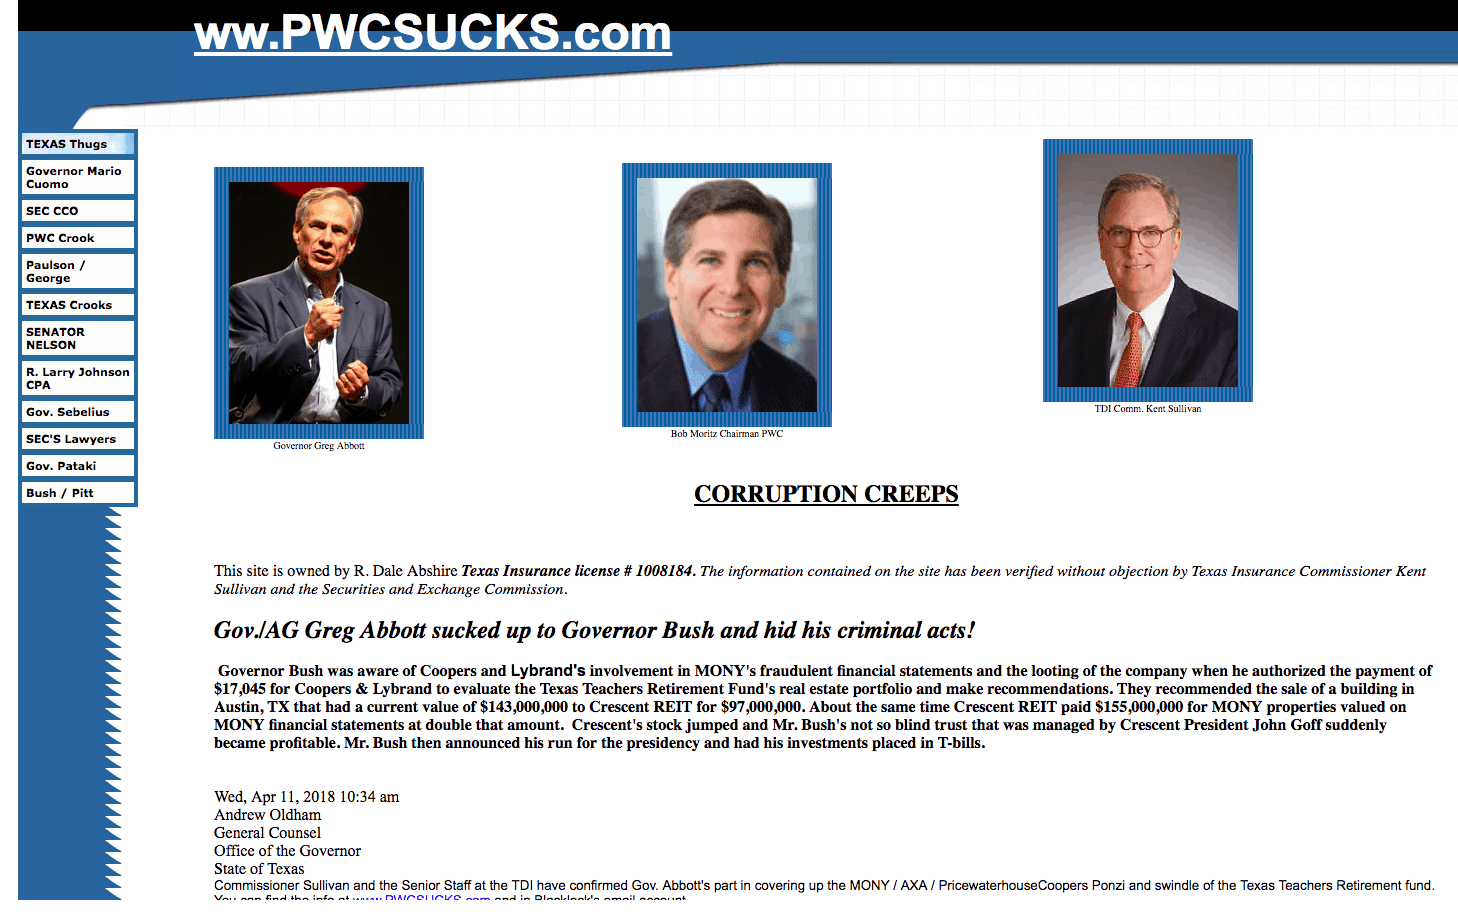 Screenshot of PwCsucks.com